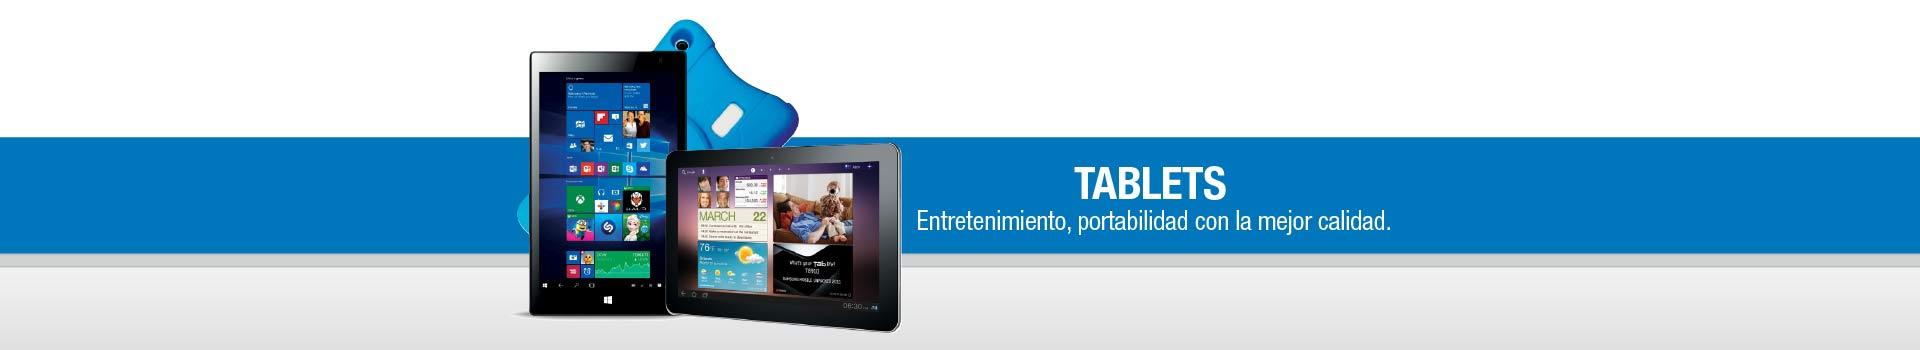 Categoría Tablets